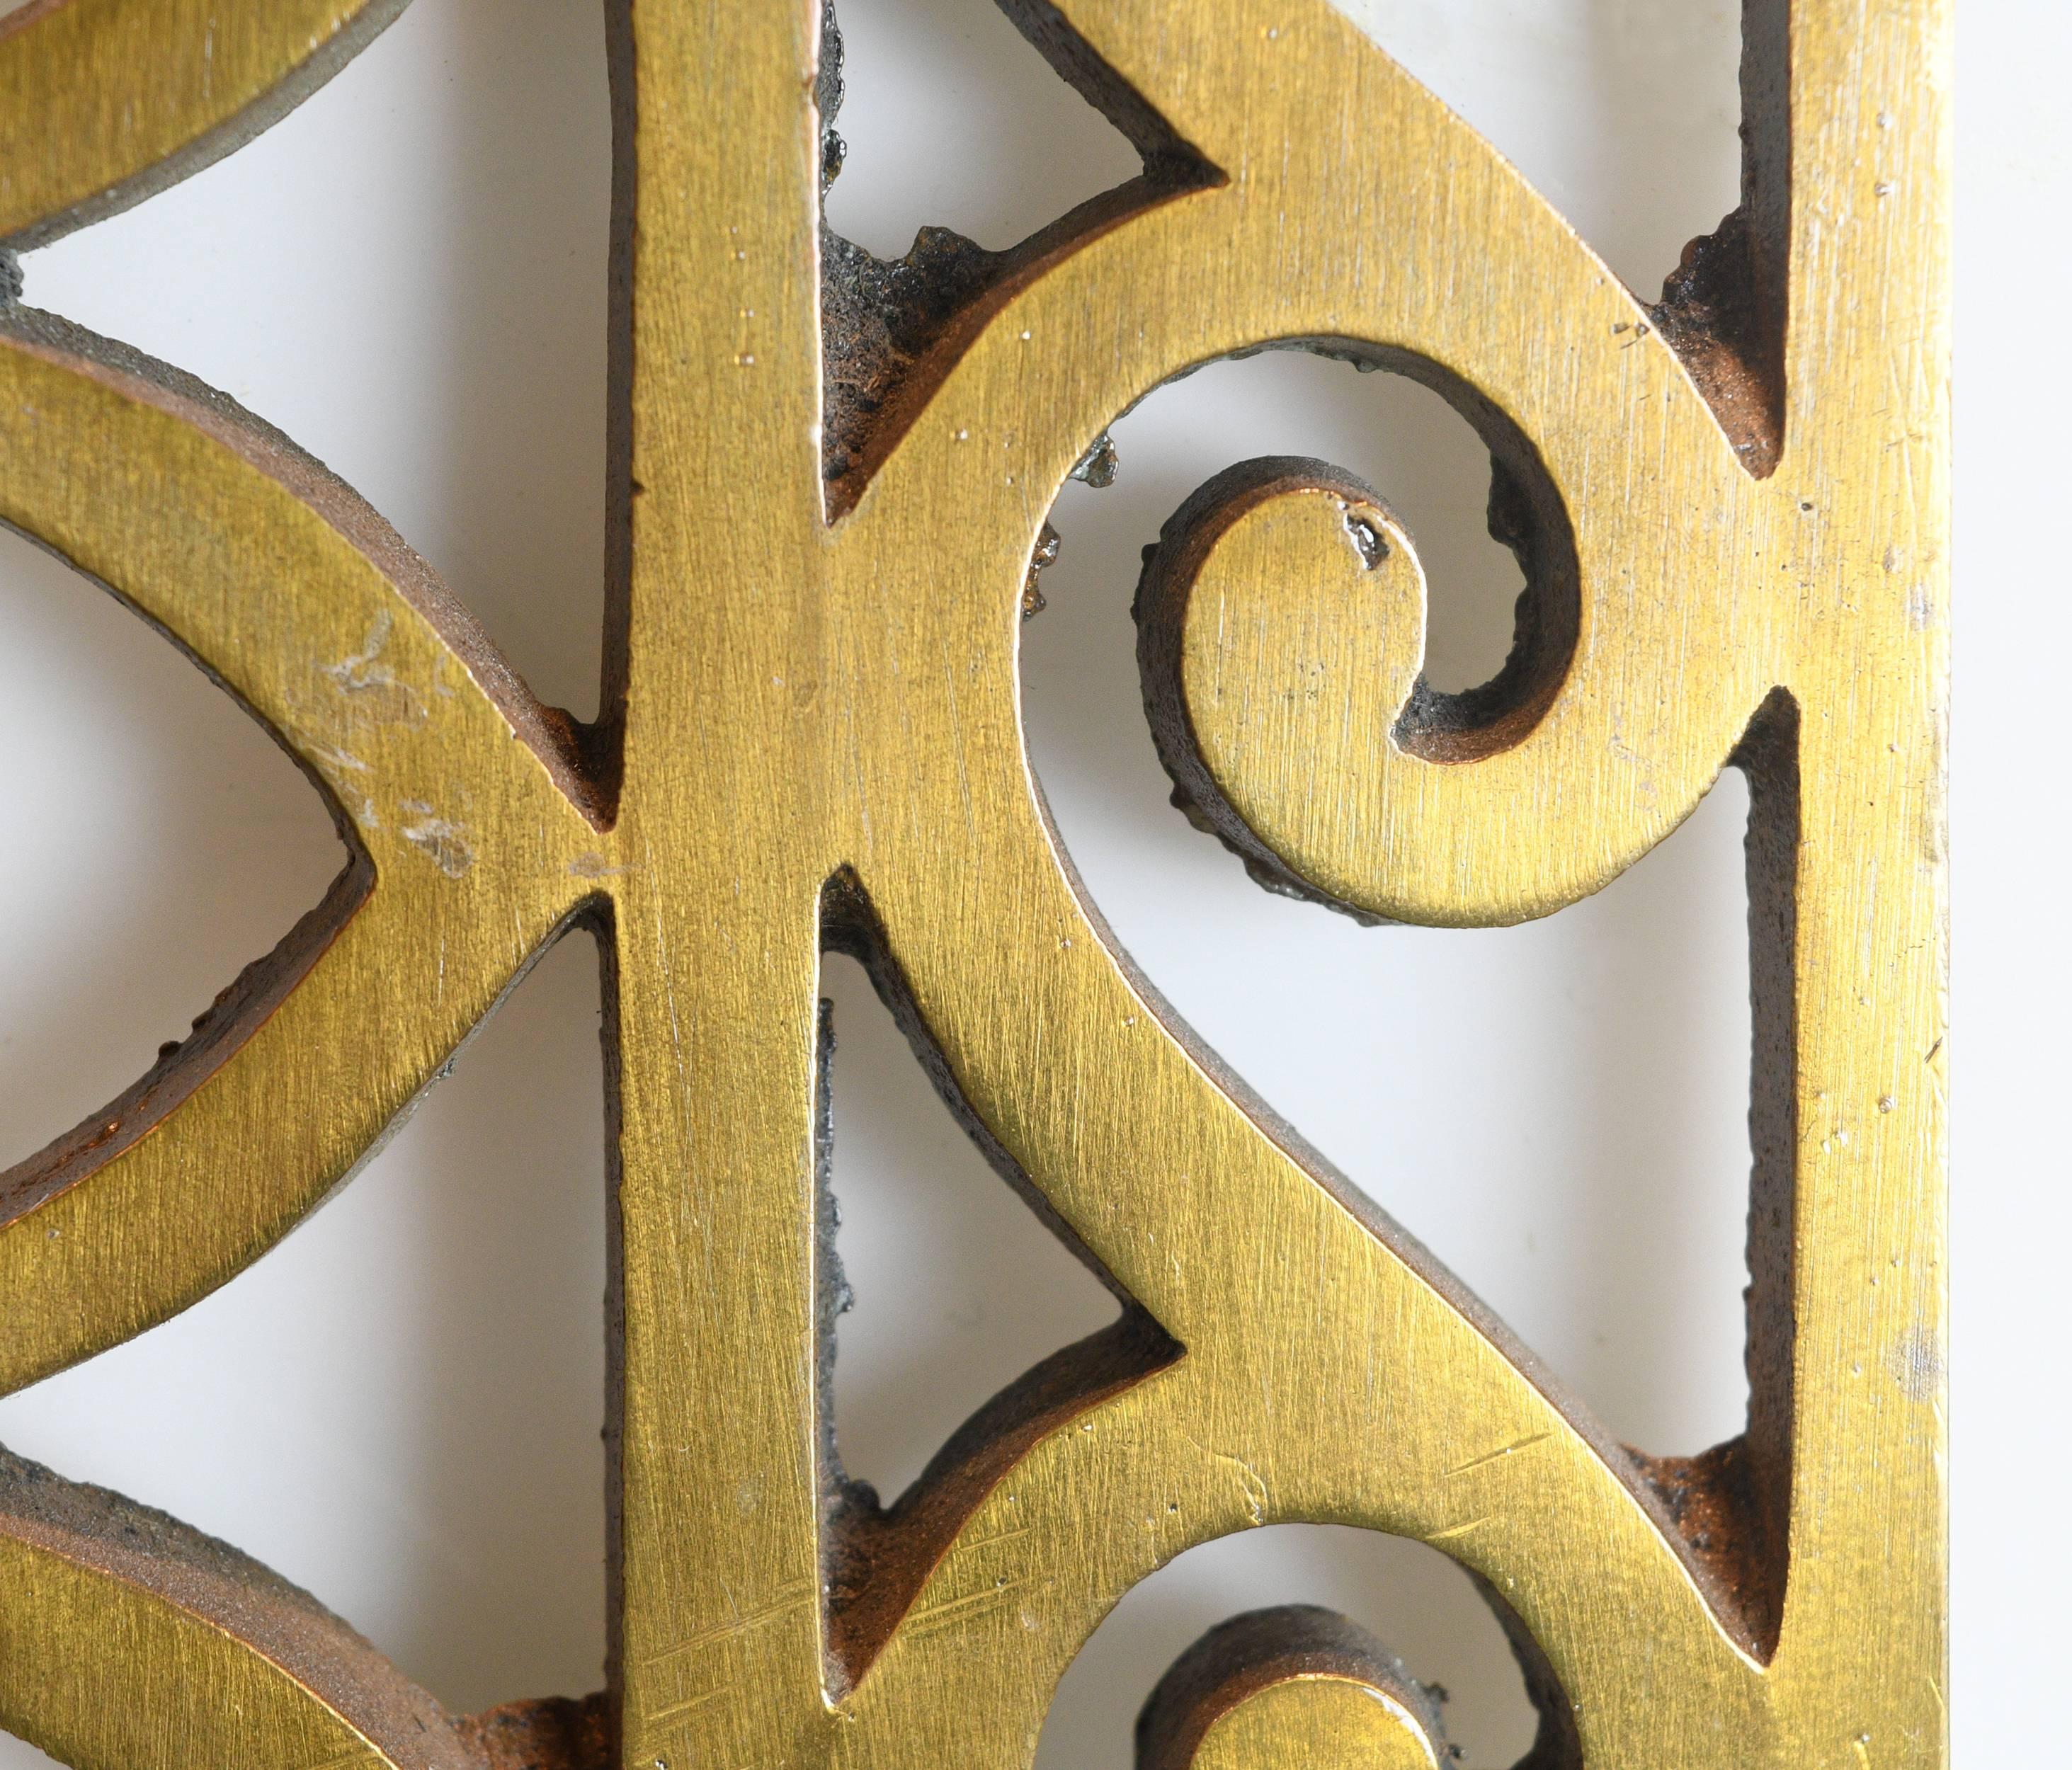 Amazing Decor Grates Wall Register Frieze - Art & Wall Decor ...